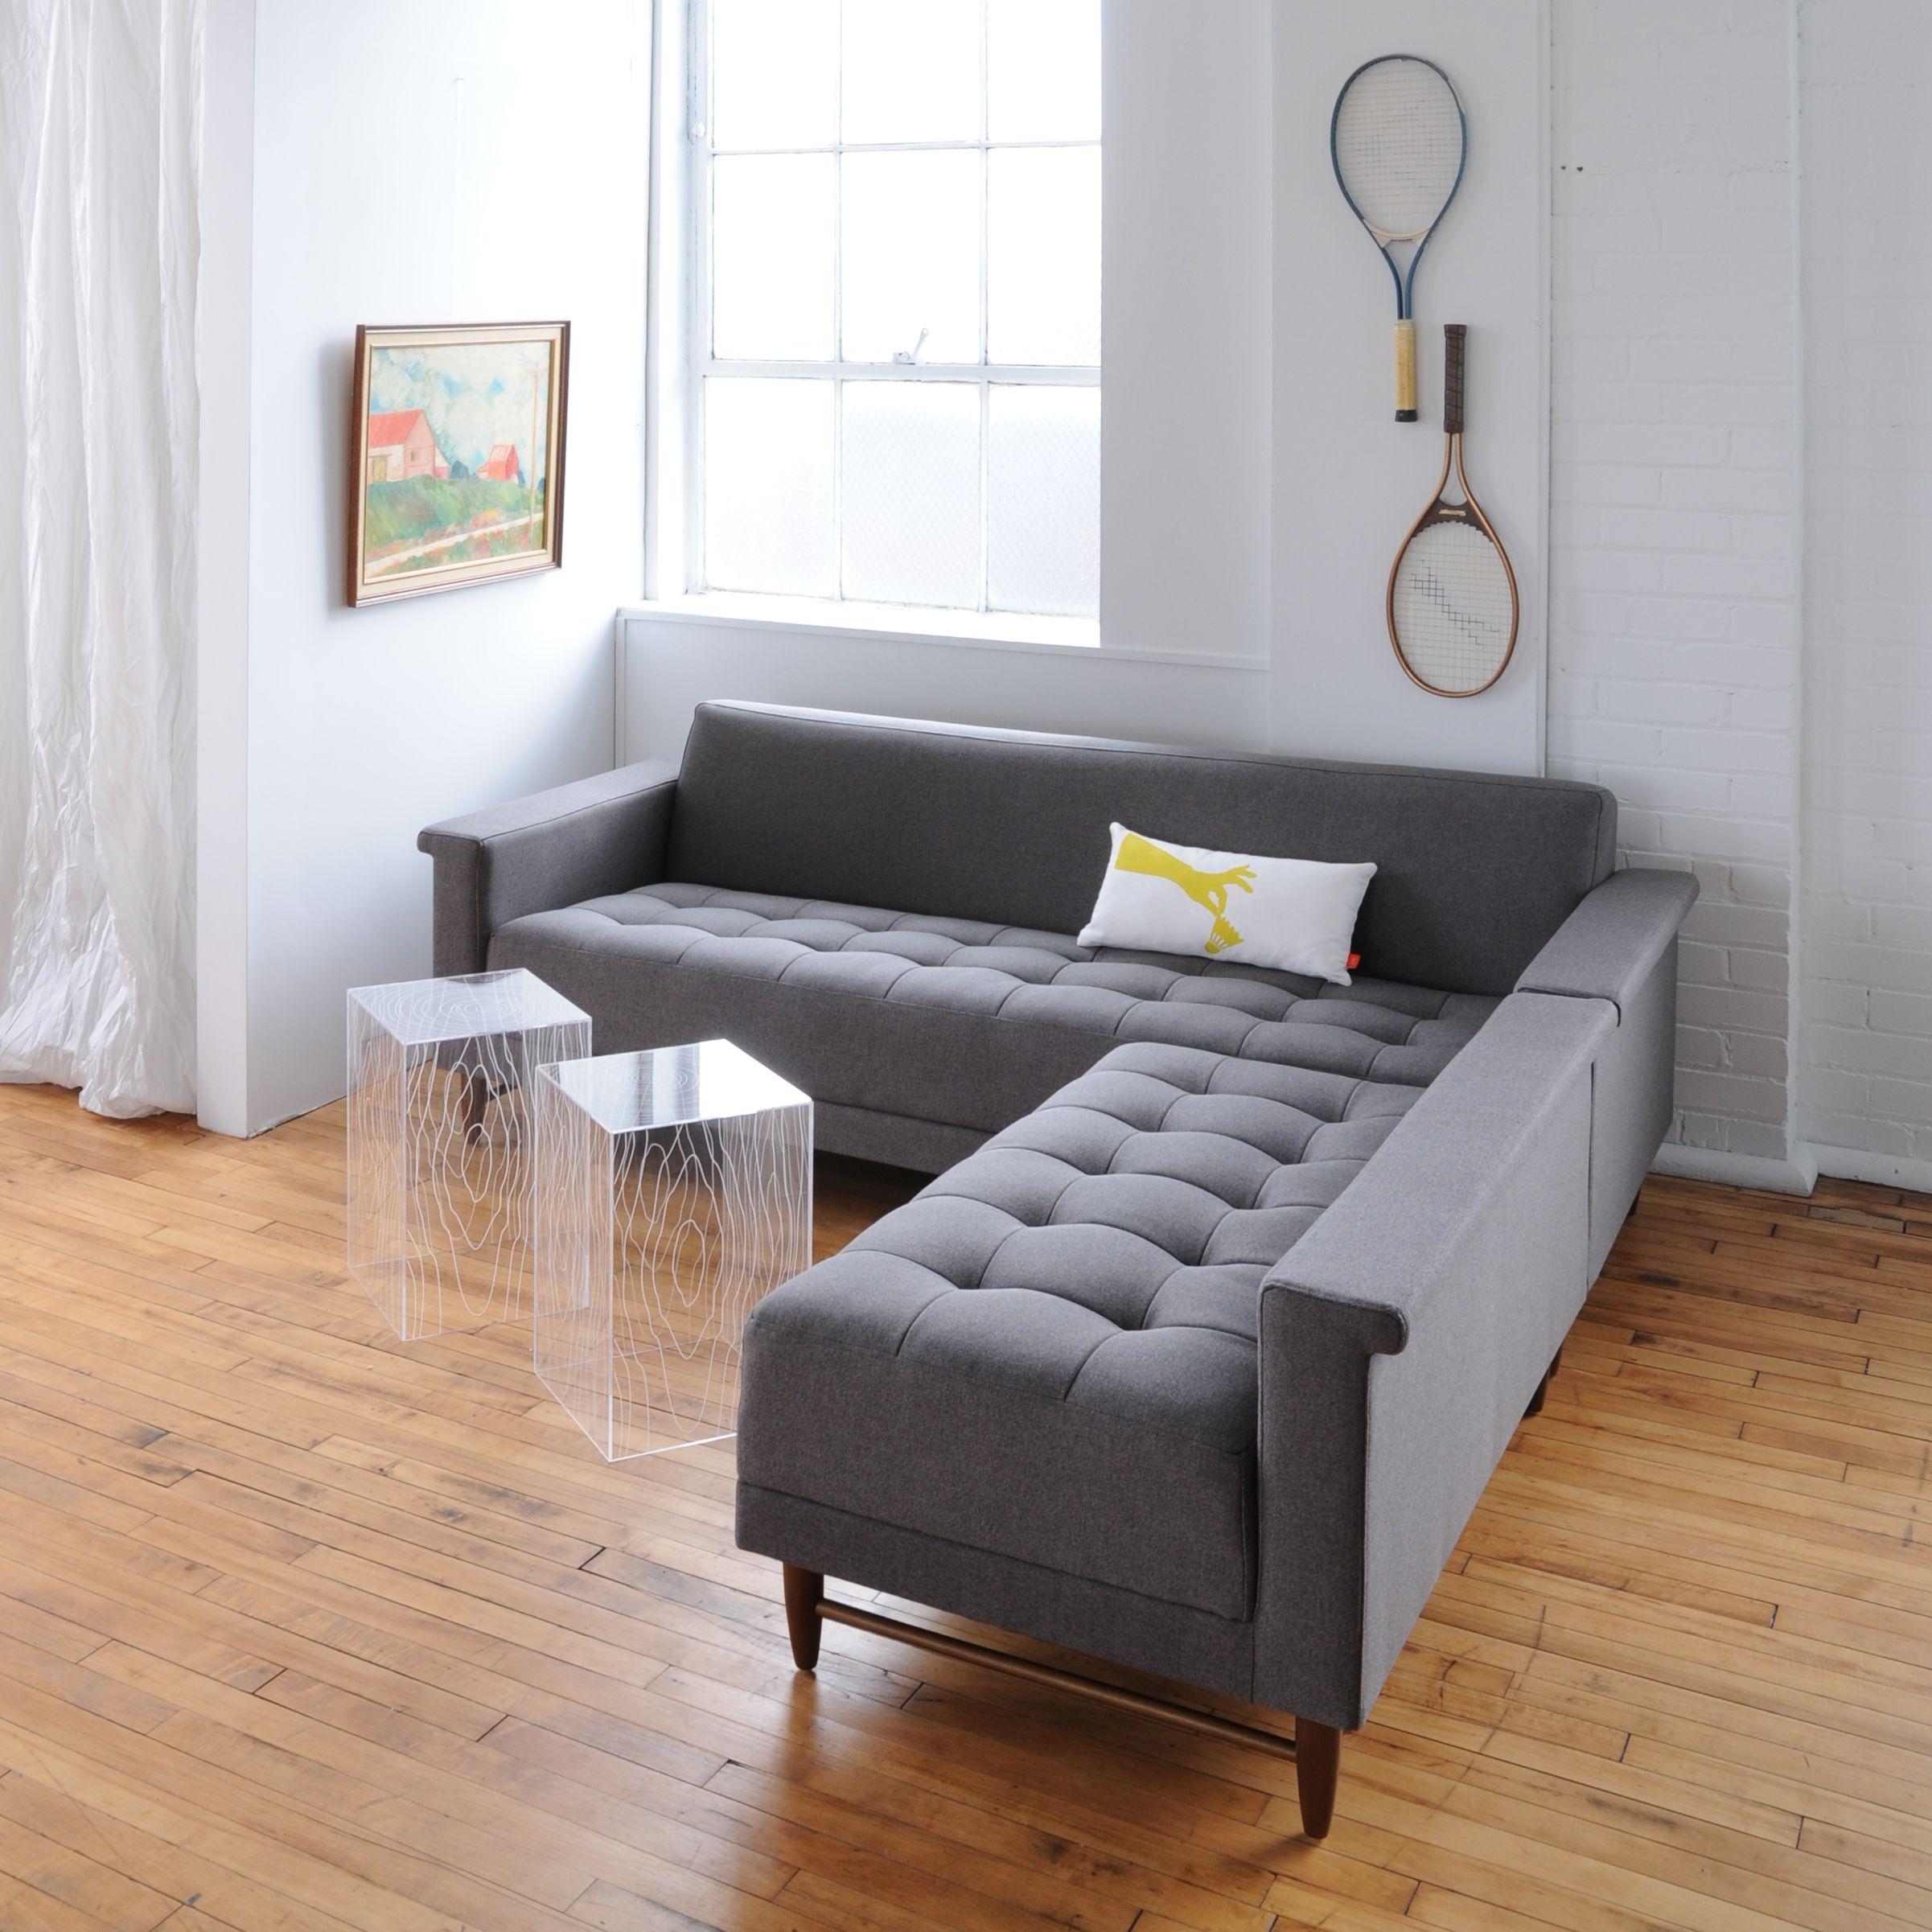 Gus Modern Harbord Loft Bi Sectional Http Www Gusmodern Com Products1 Sofas Harbord Loft Bise Modern Sofa Sectional Modern Sectional Corner Sectional Sofa